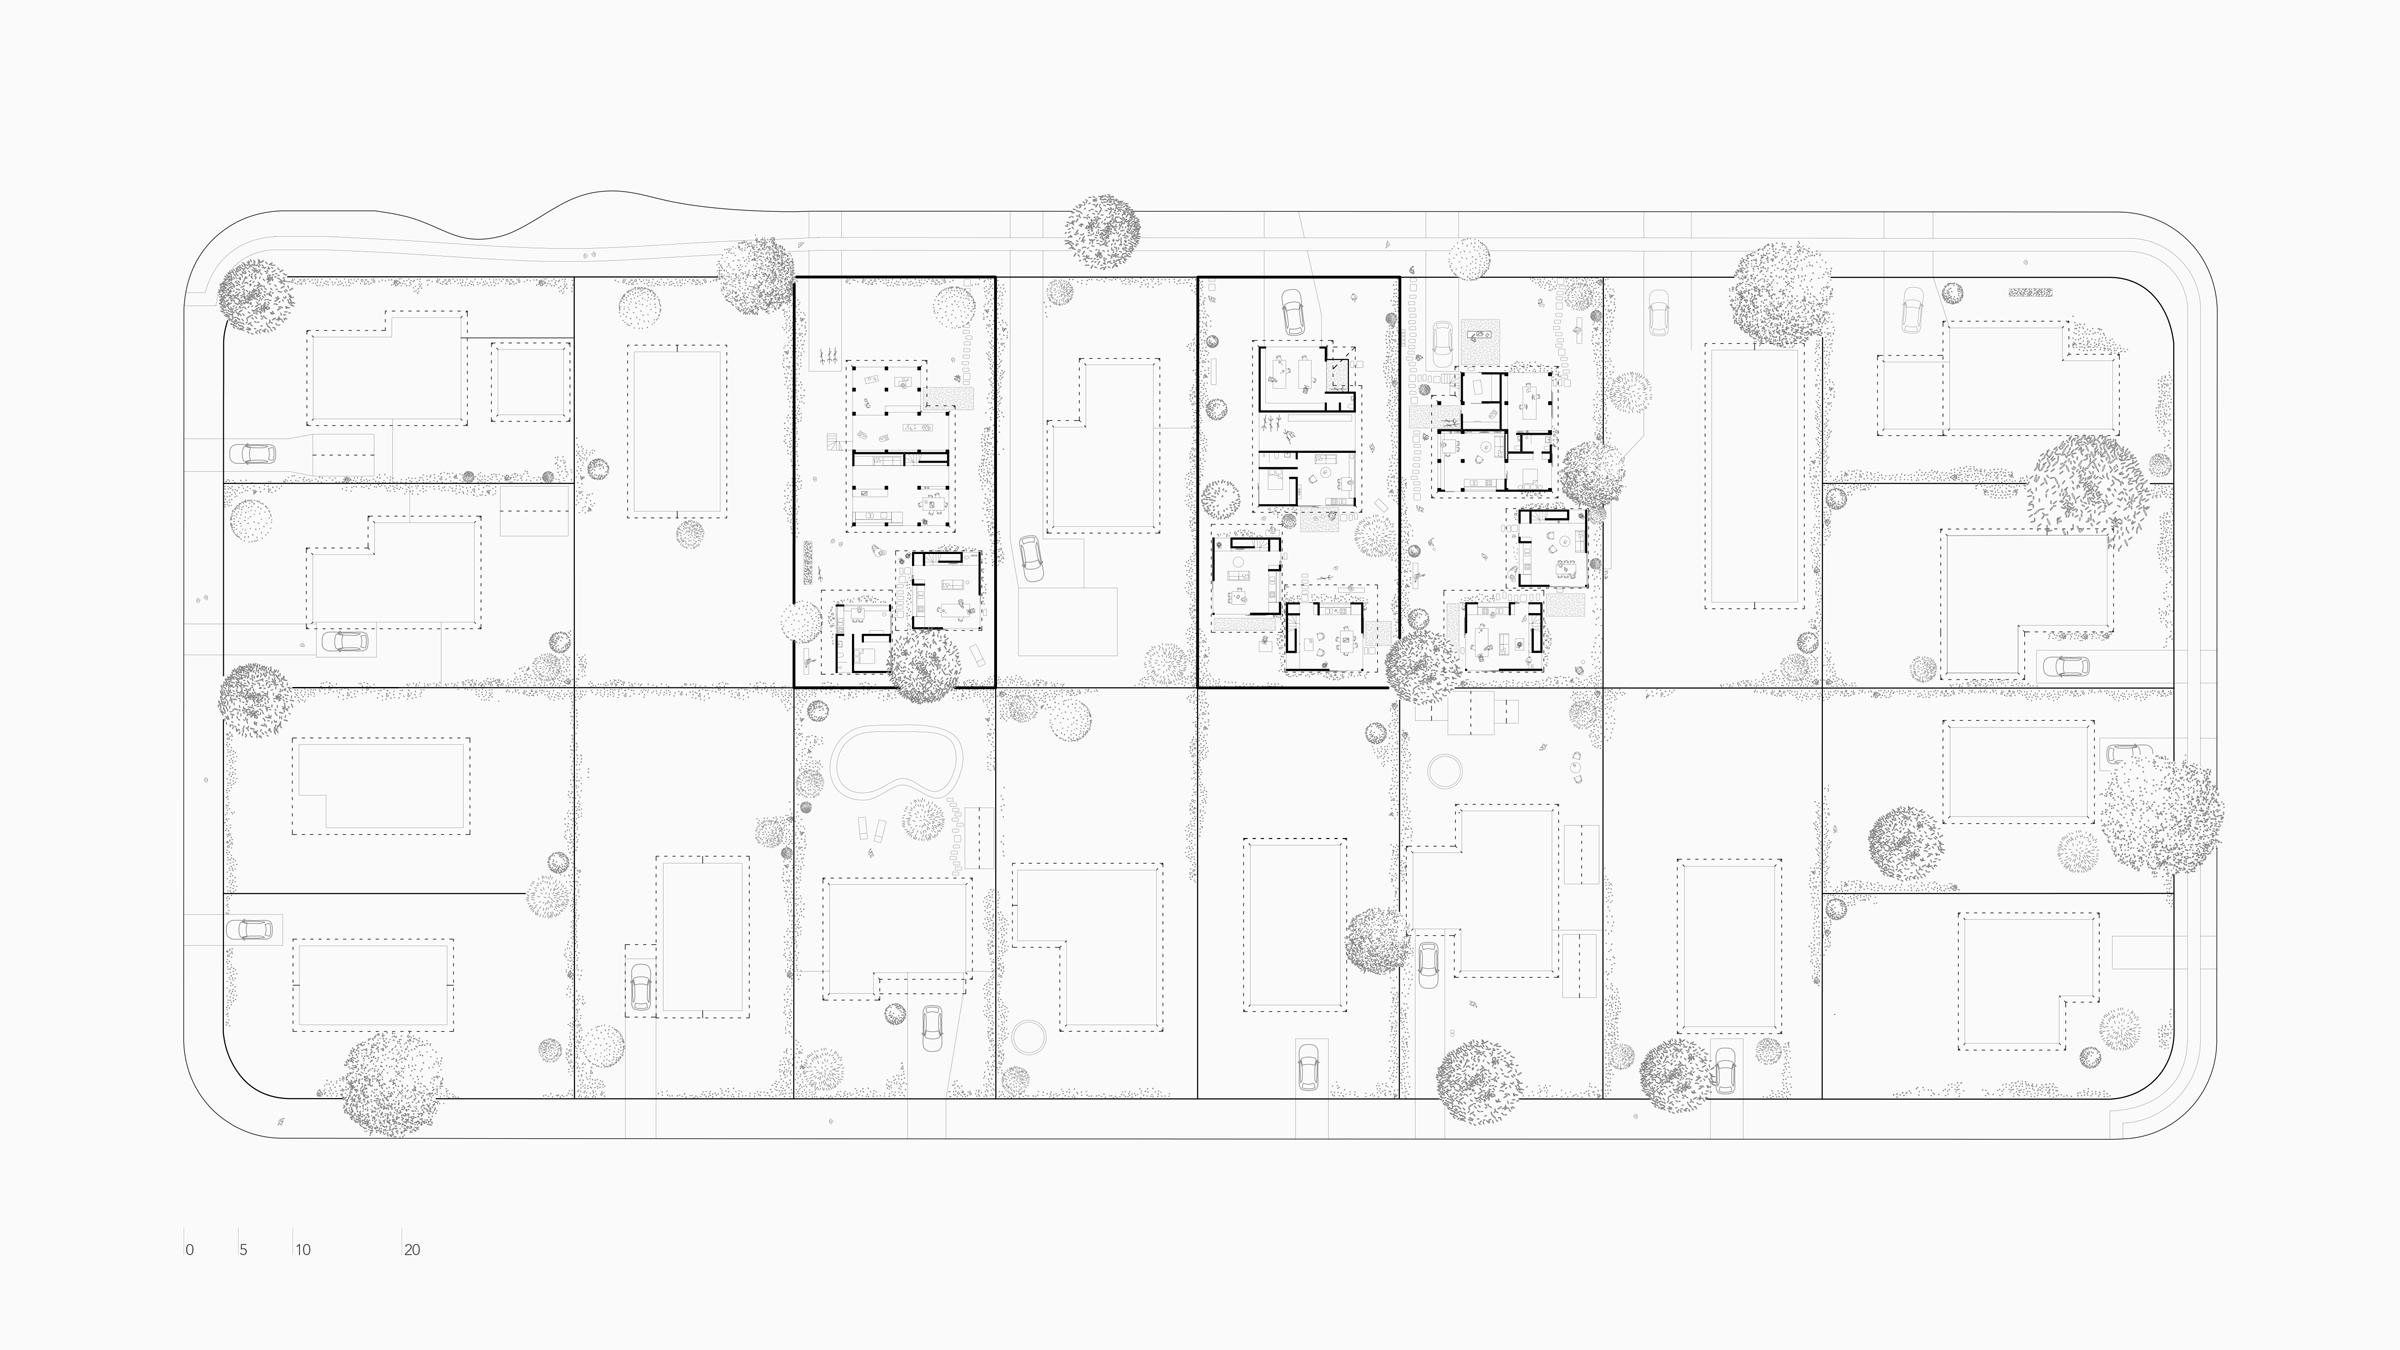 171212-Dappled-Dwellings-Site-Plan-Stage-02.jpg